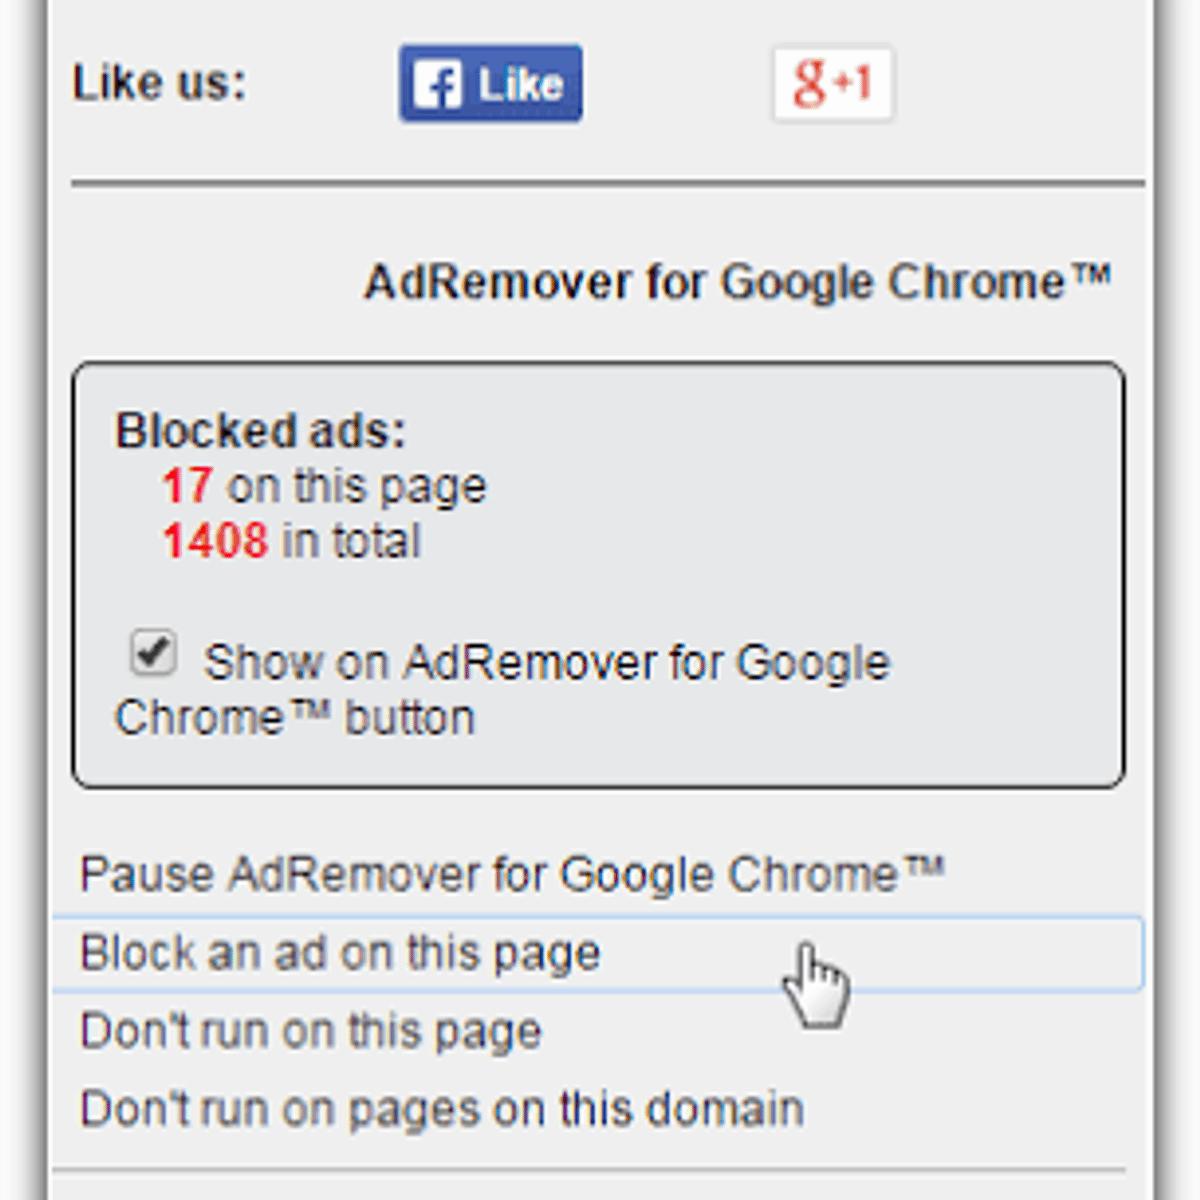 AdRemover for Google Chrome Alternatives and Similar